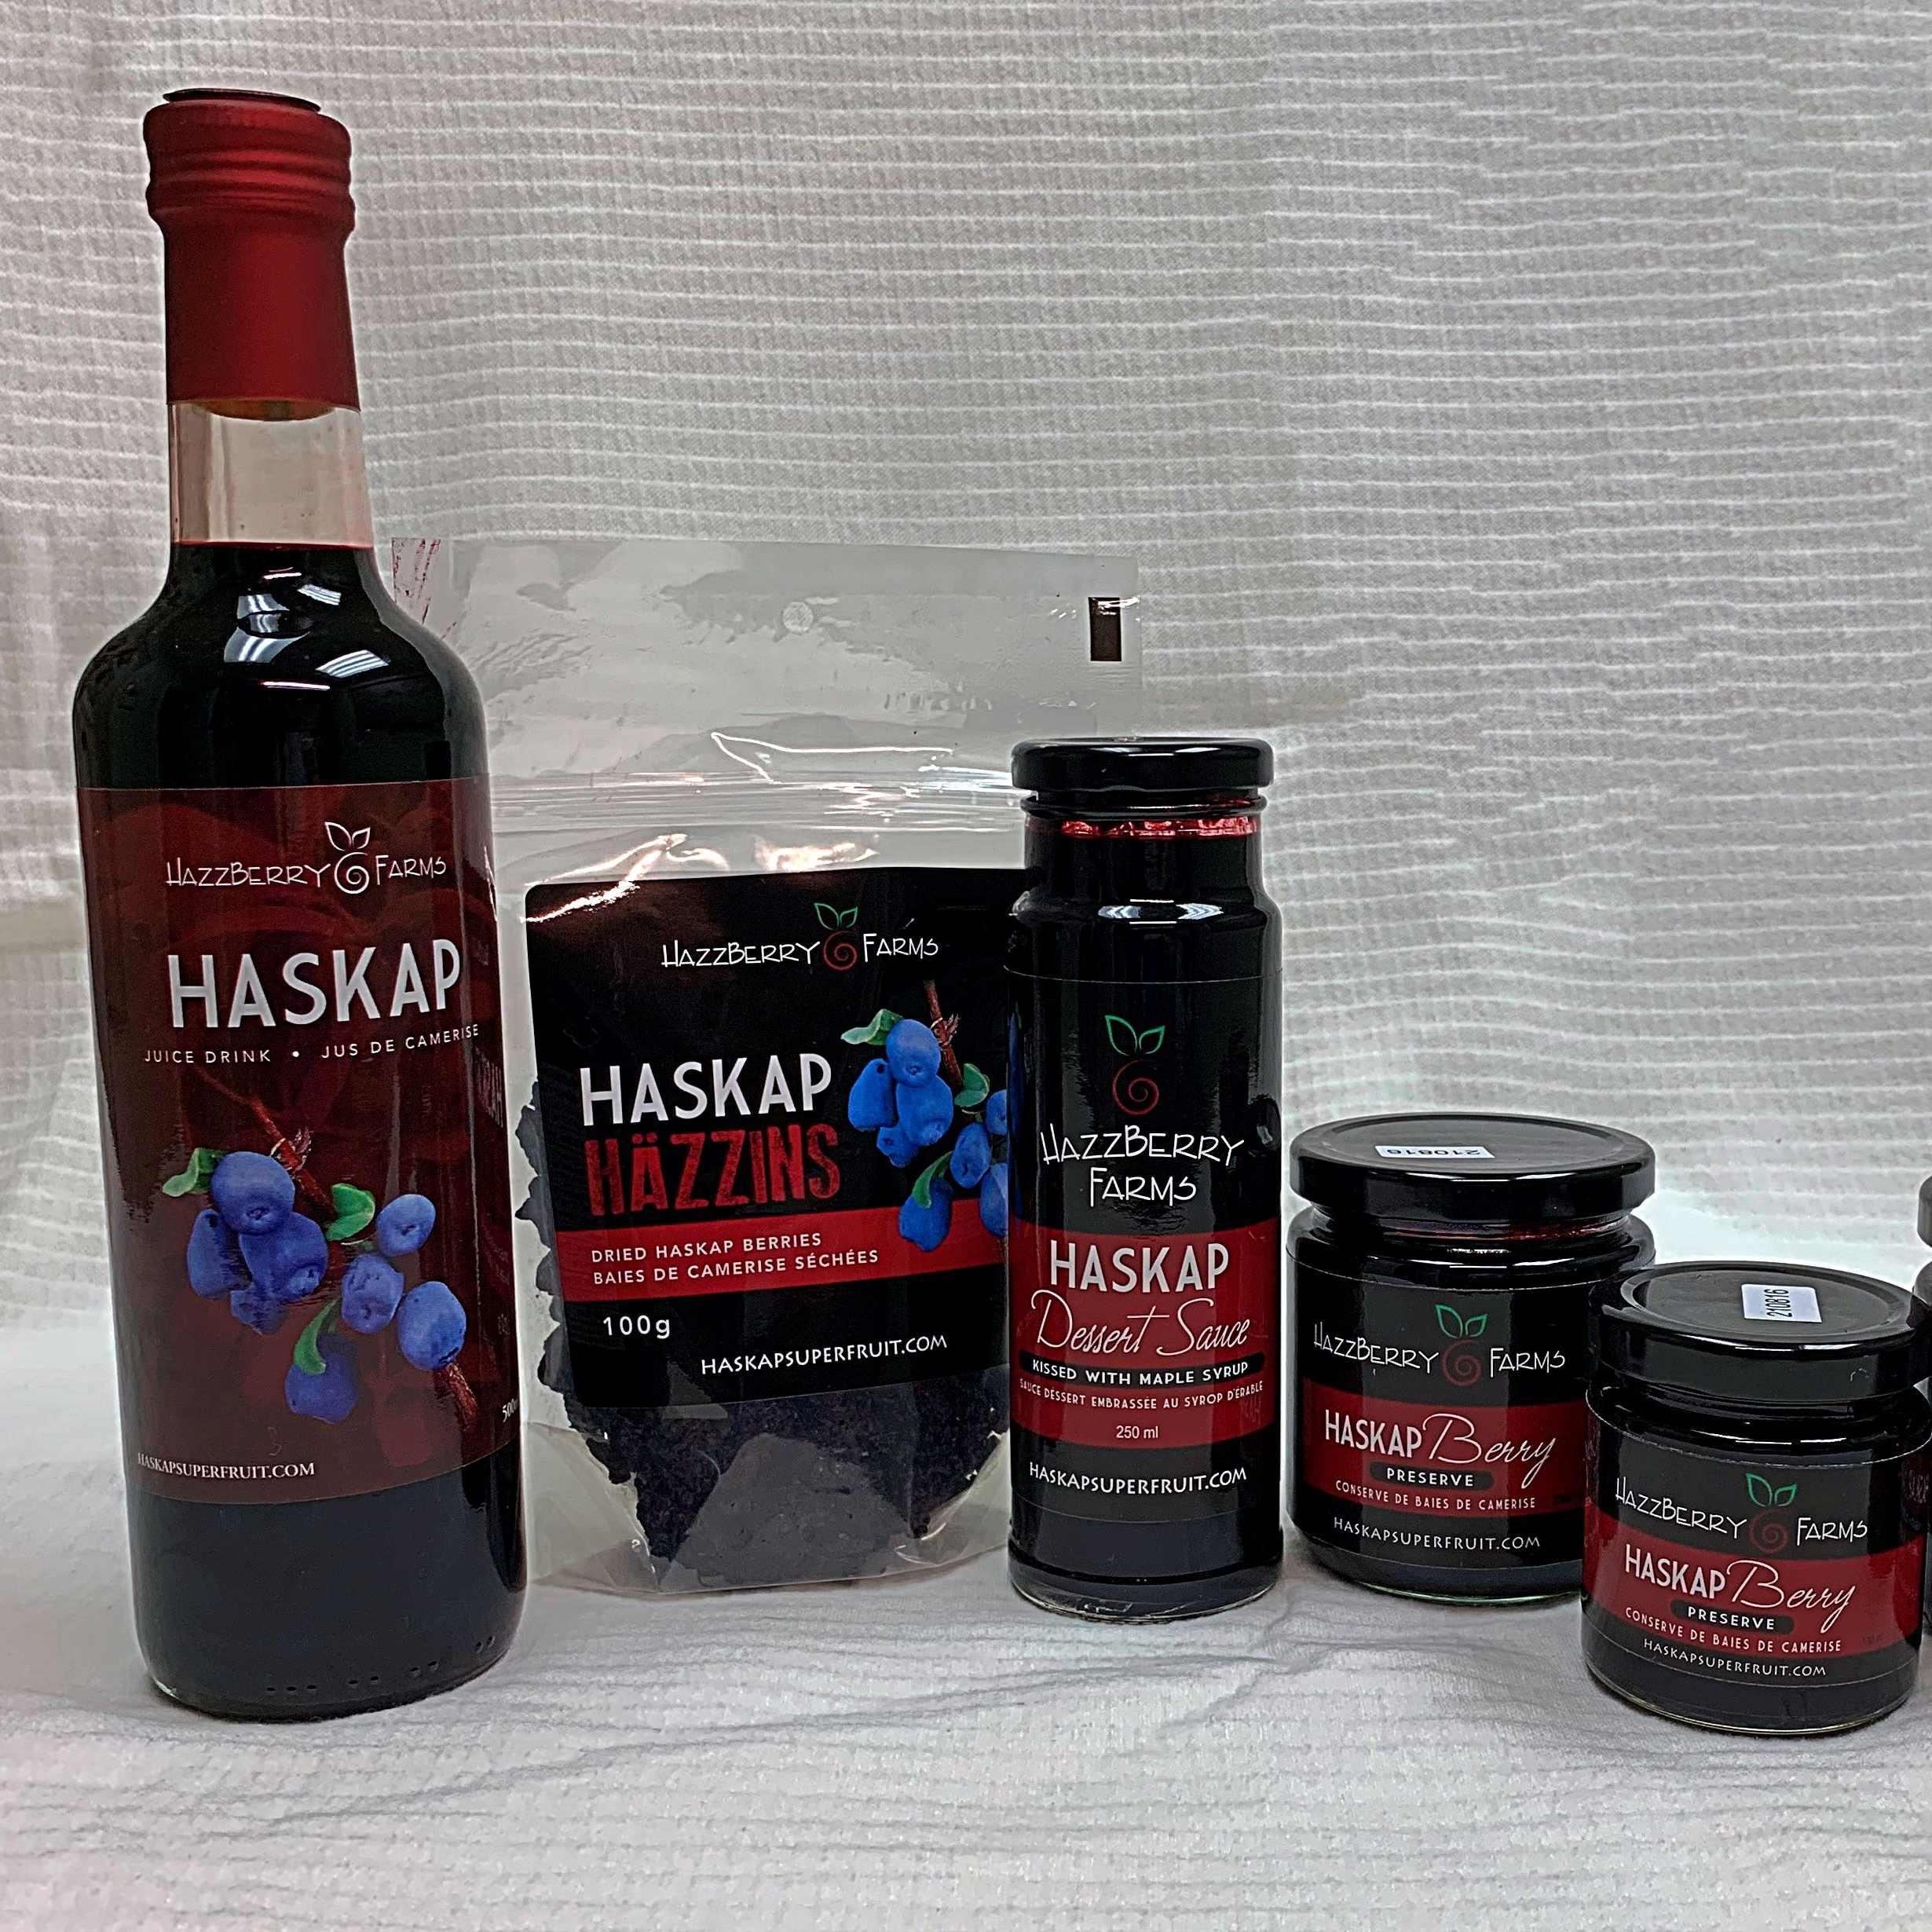 Hazzberry Farm